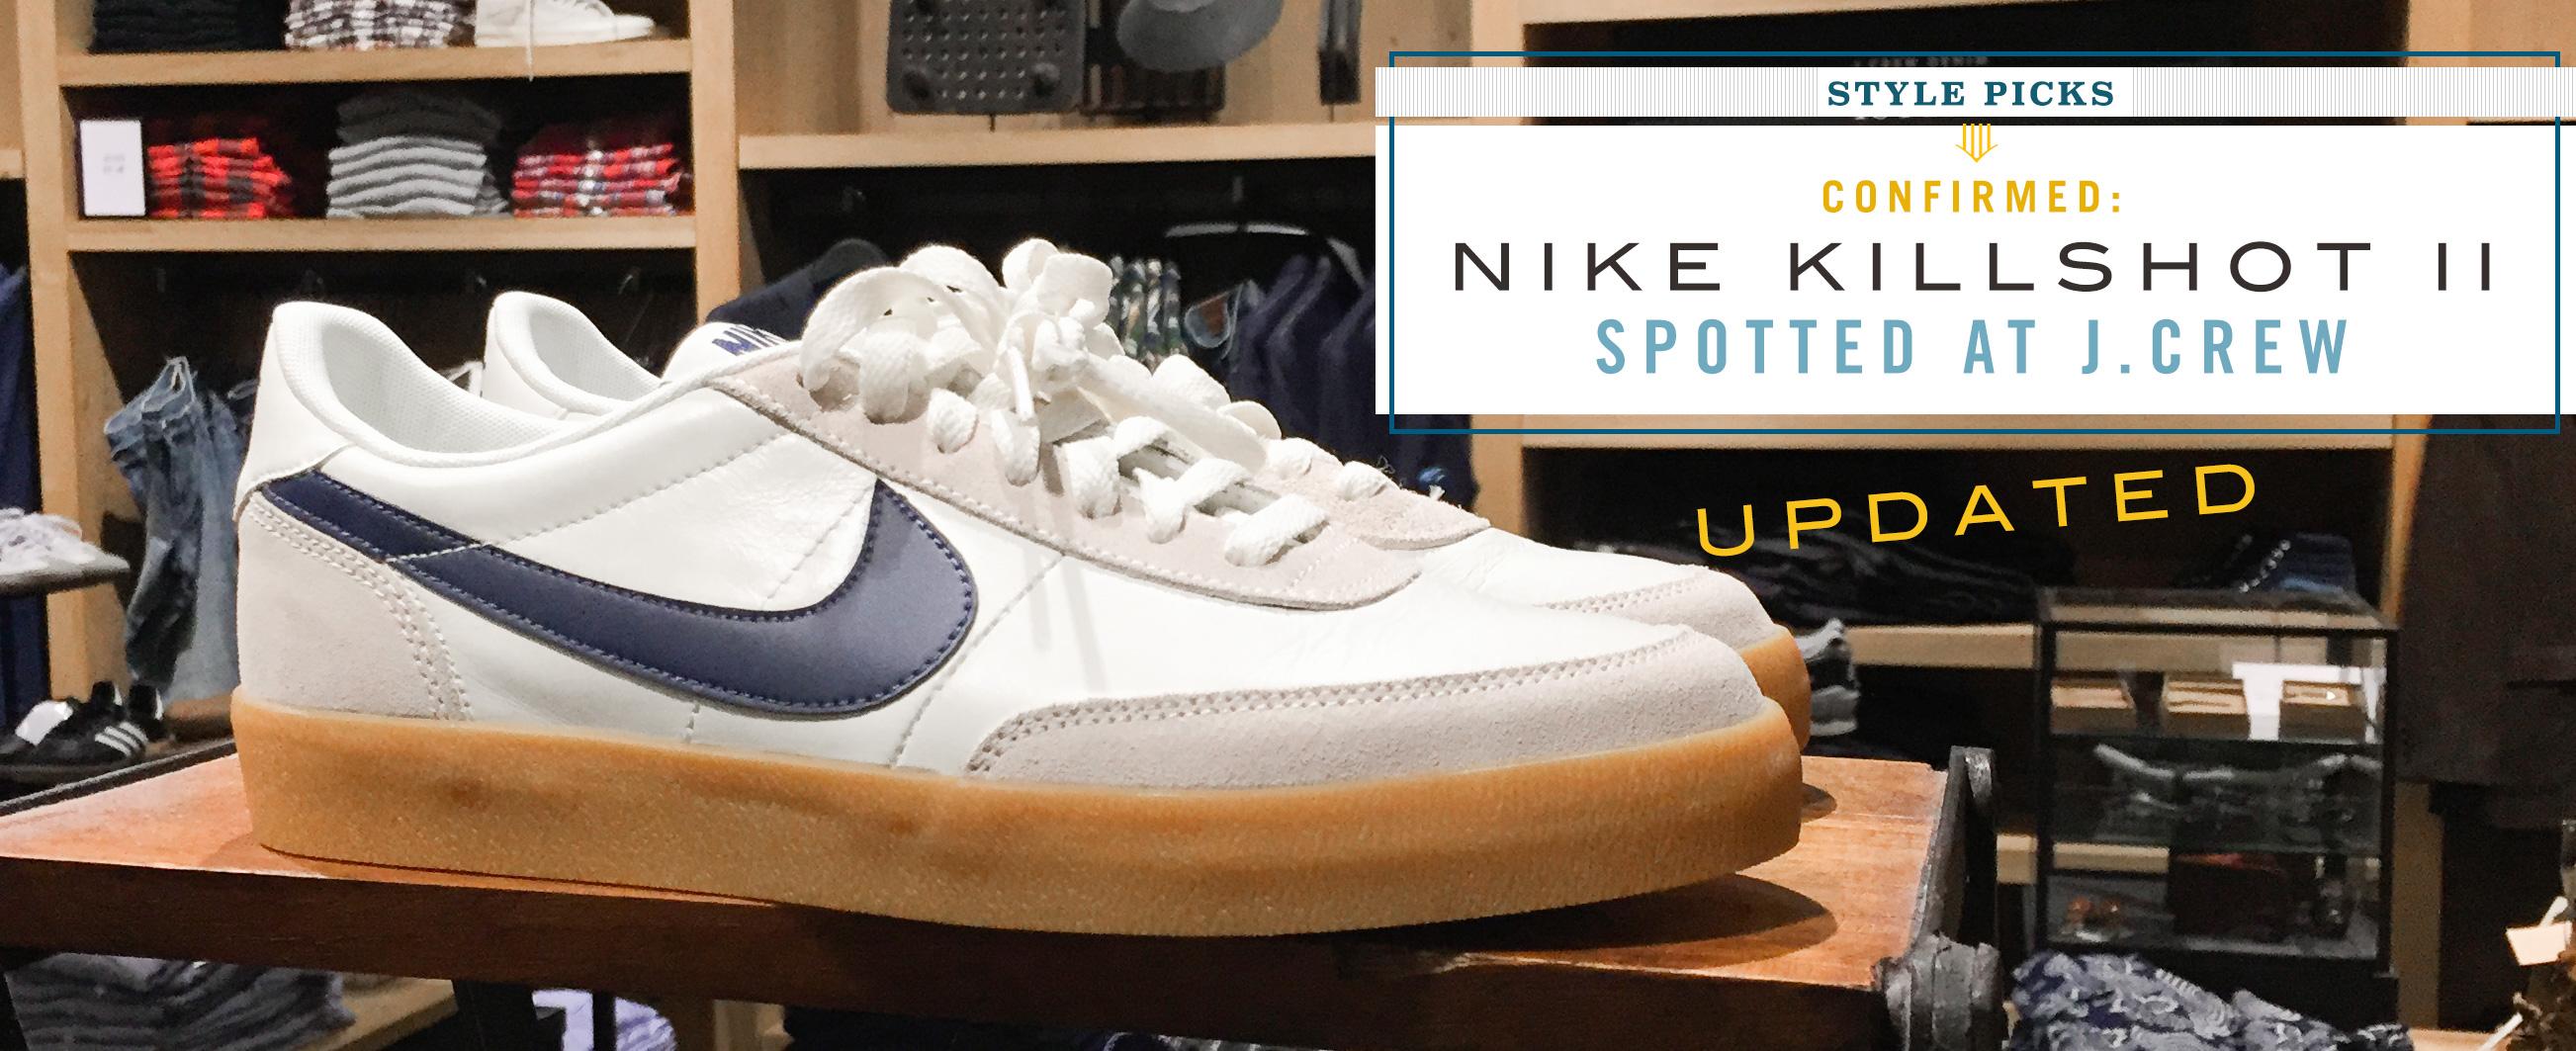 Nike's Killshot 2 Spotted in J.Crew Stores [updated]